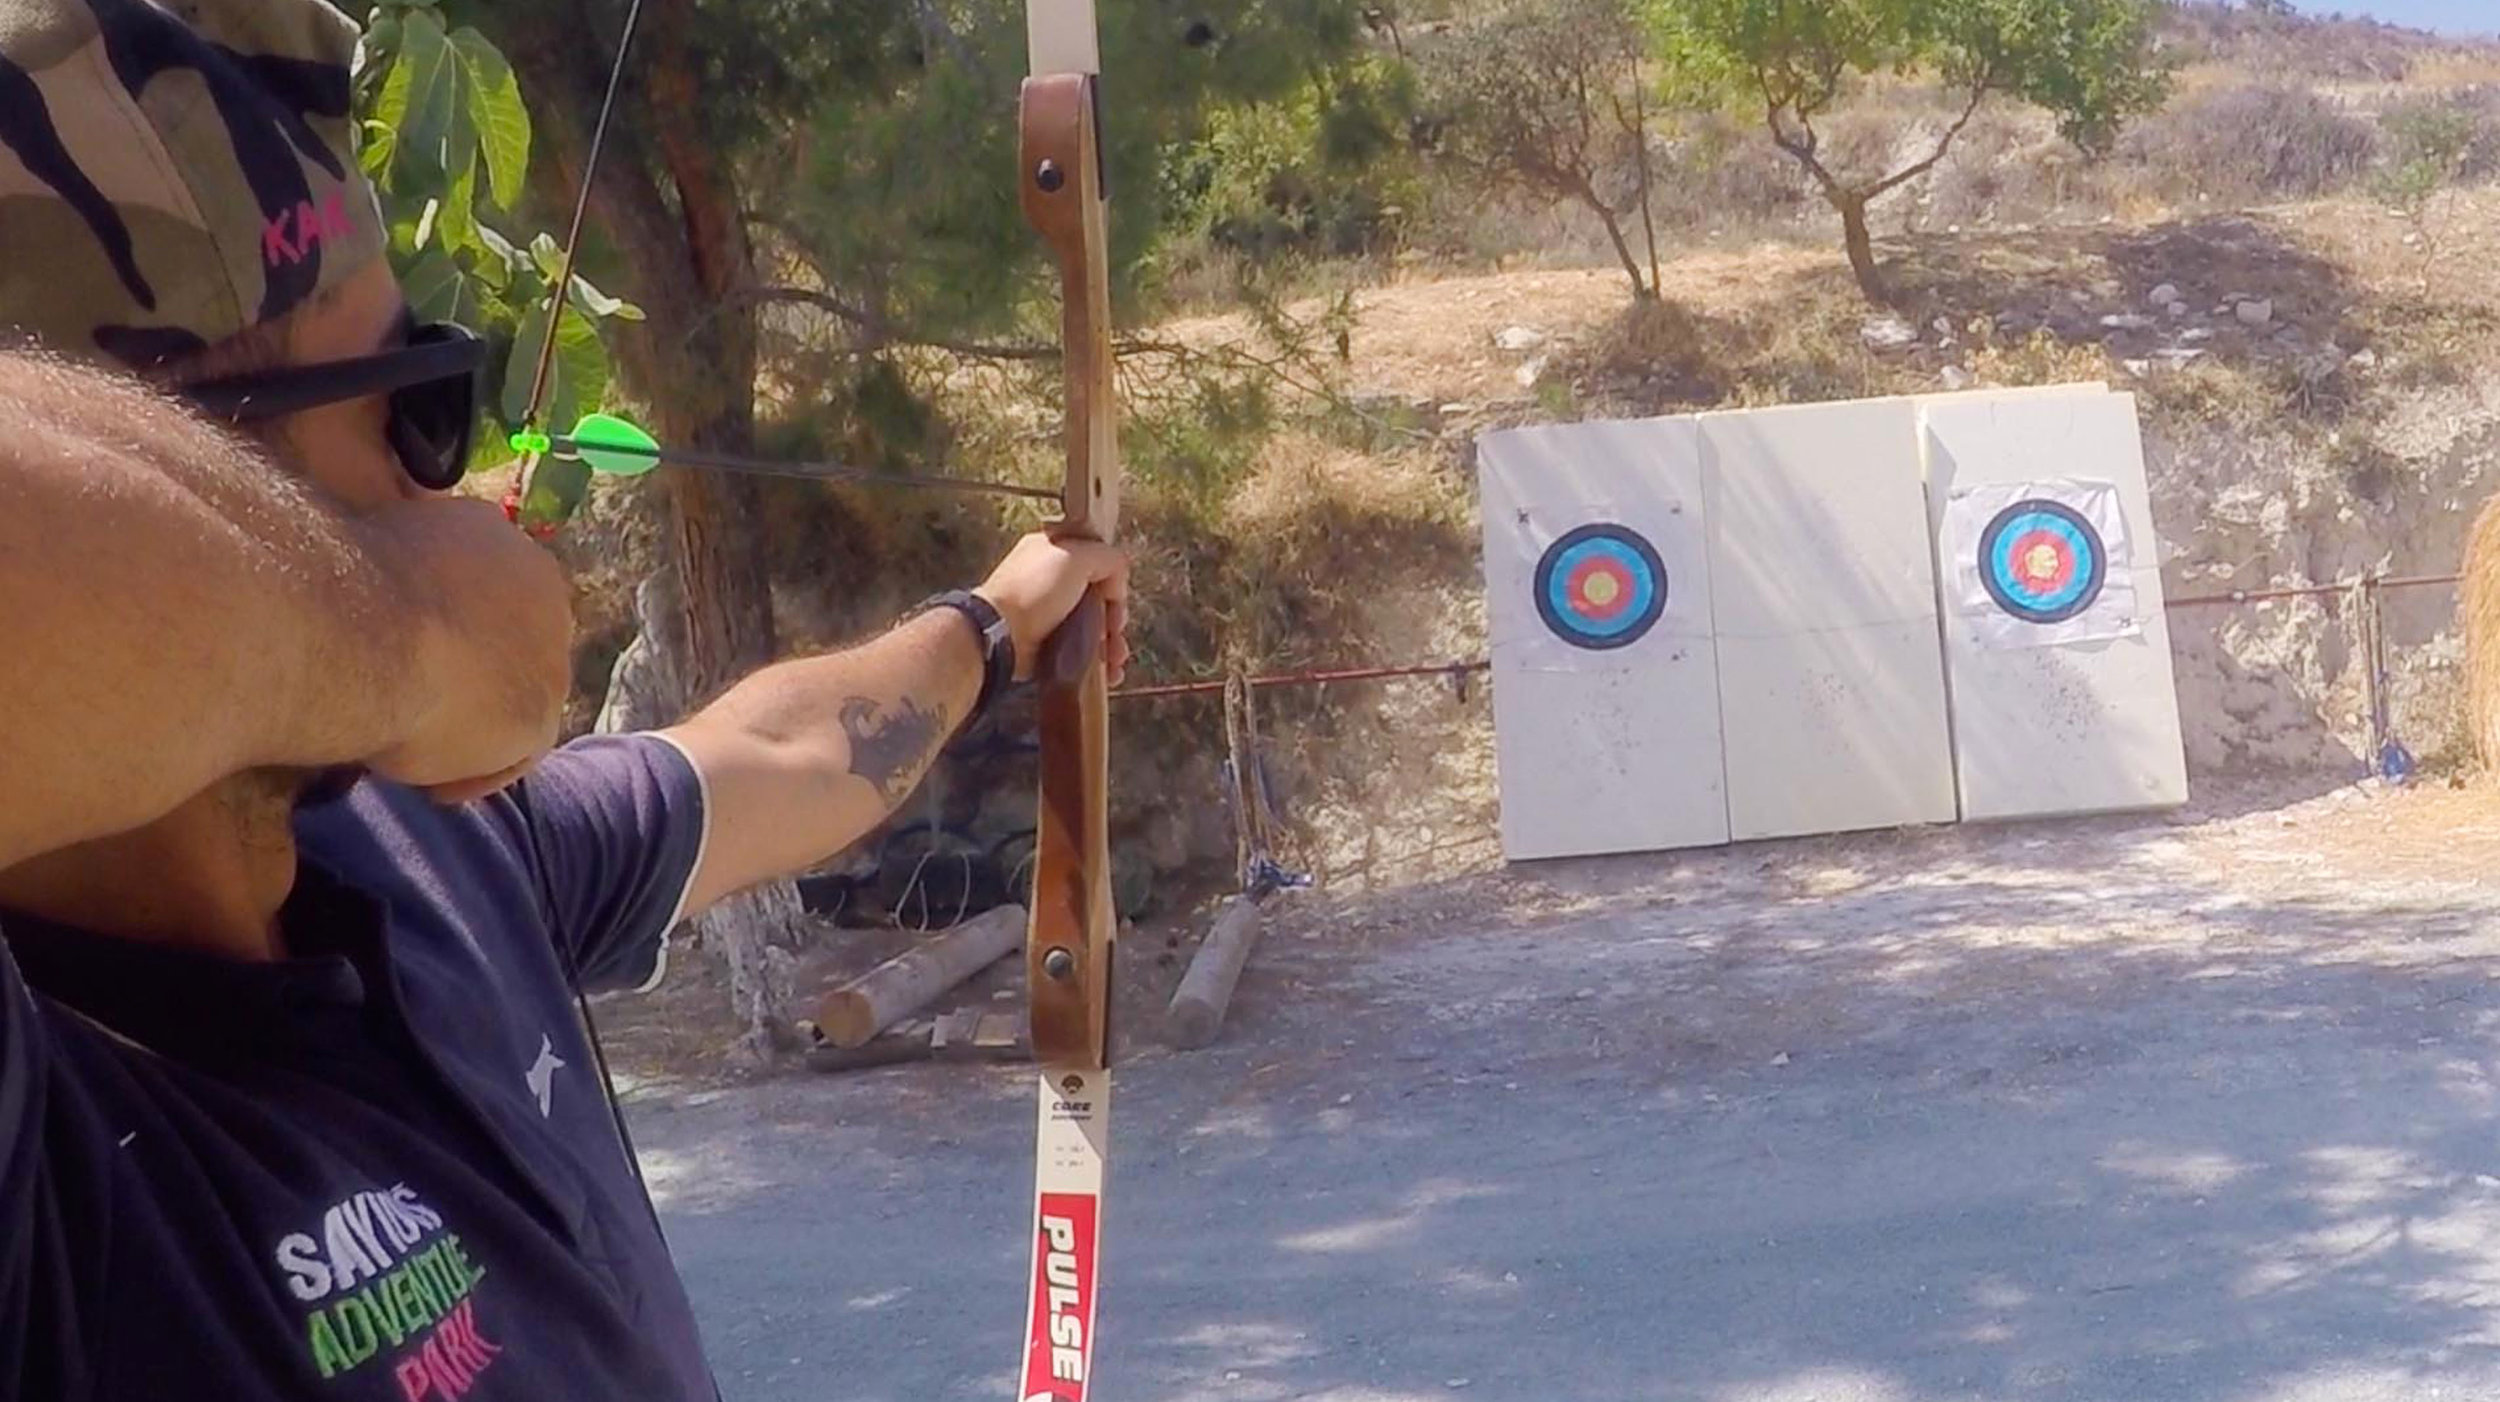 Archery - 30 minutes